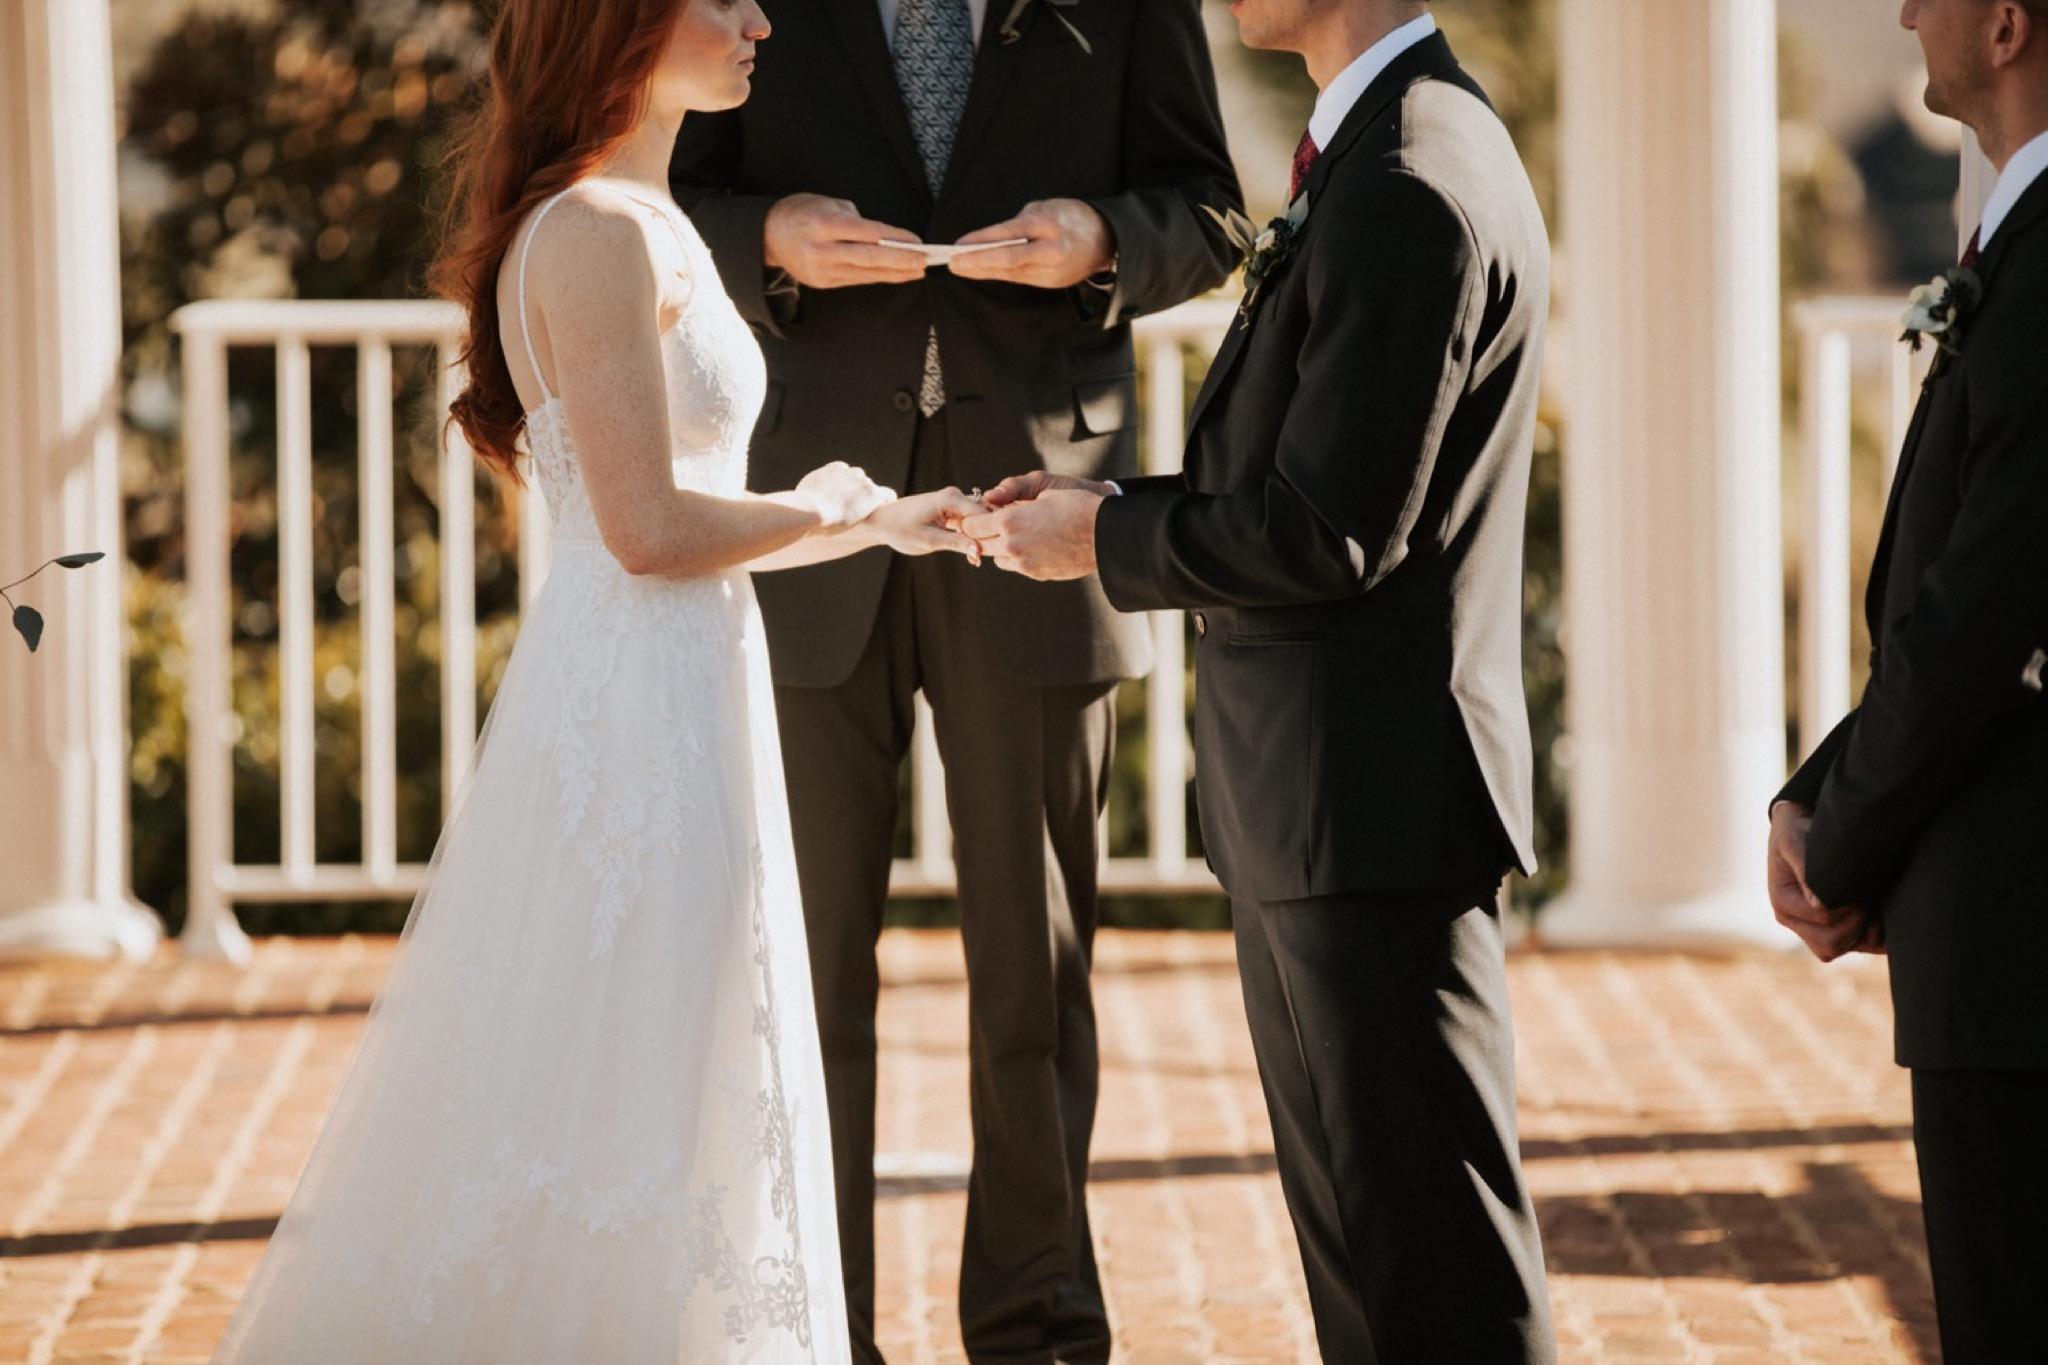 49_West Manor Estate Weddings - Pat Cori Photography-103_Ceremony_VirginiaWeddingPhotographer_PatCoriPhotography_WestManorEstate_Wedding.jpg